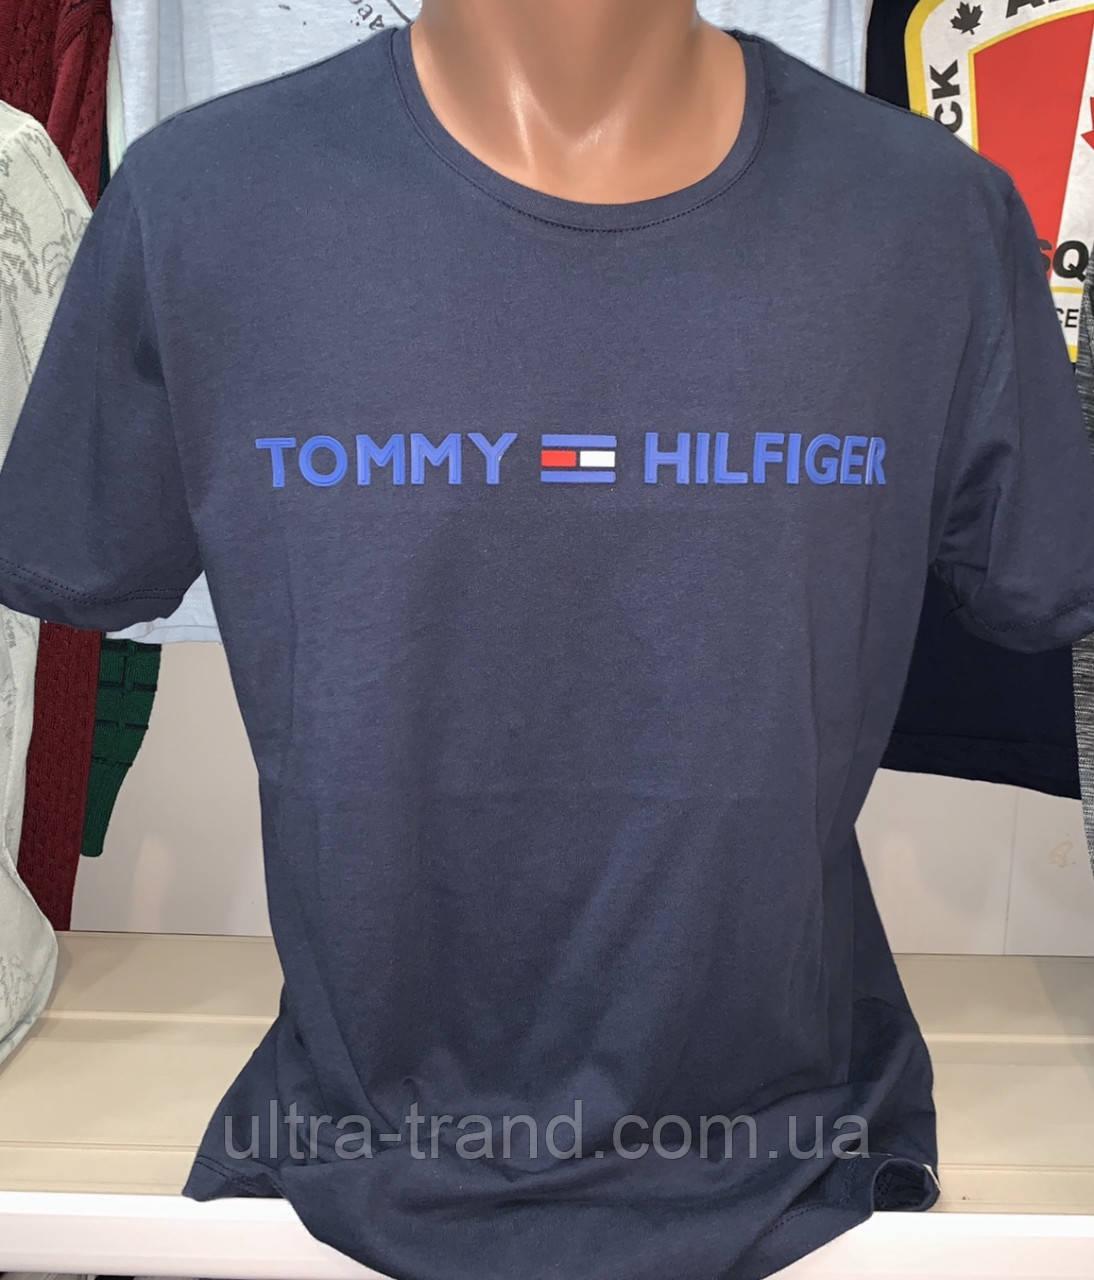 f57ed6e9f3f4a Брендовые мужские турецкие футболки Hilfiger реплика: продажа, цена ...